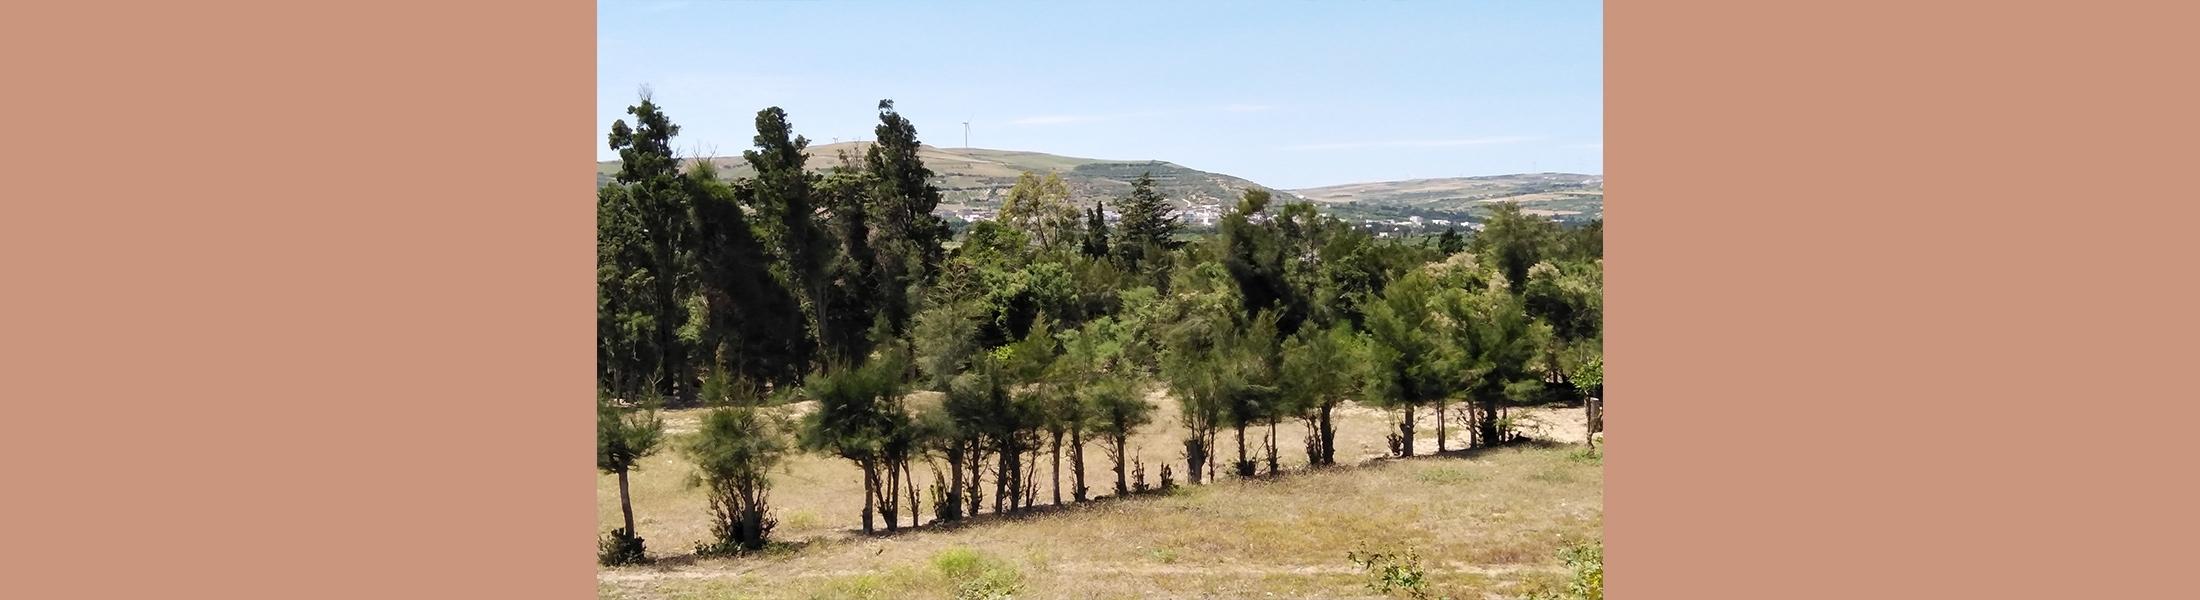 Terrain «Ras Djebel 1» ( AO 03/2020)